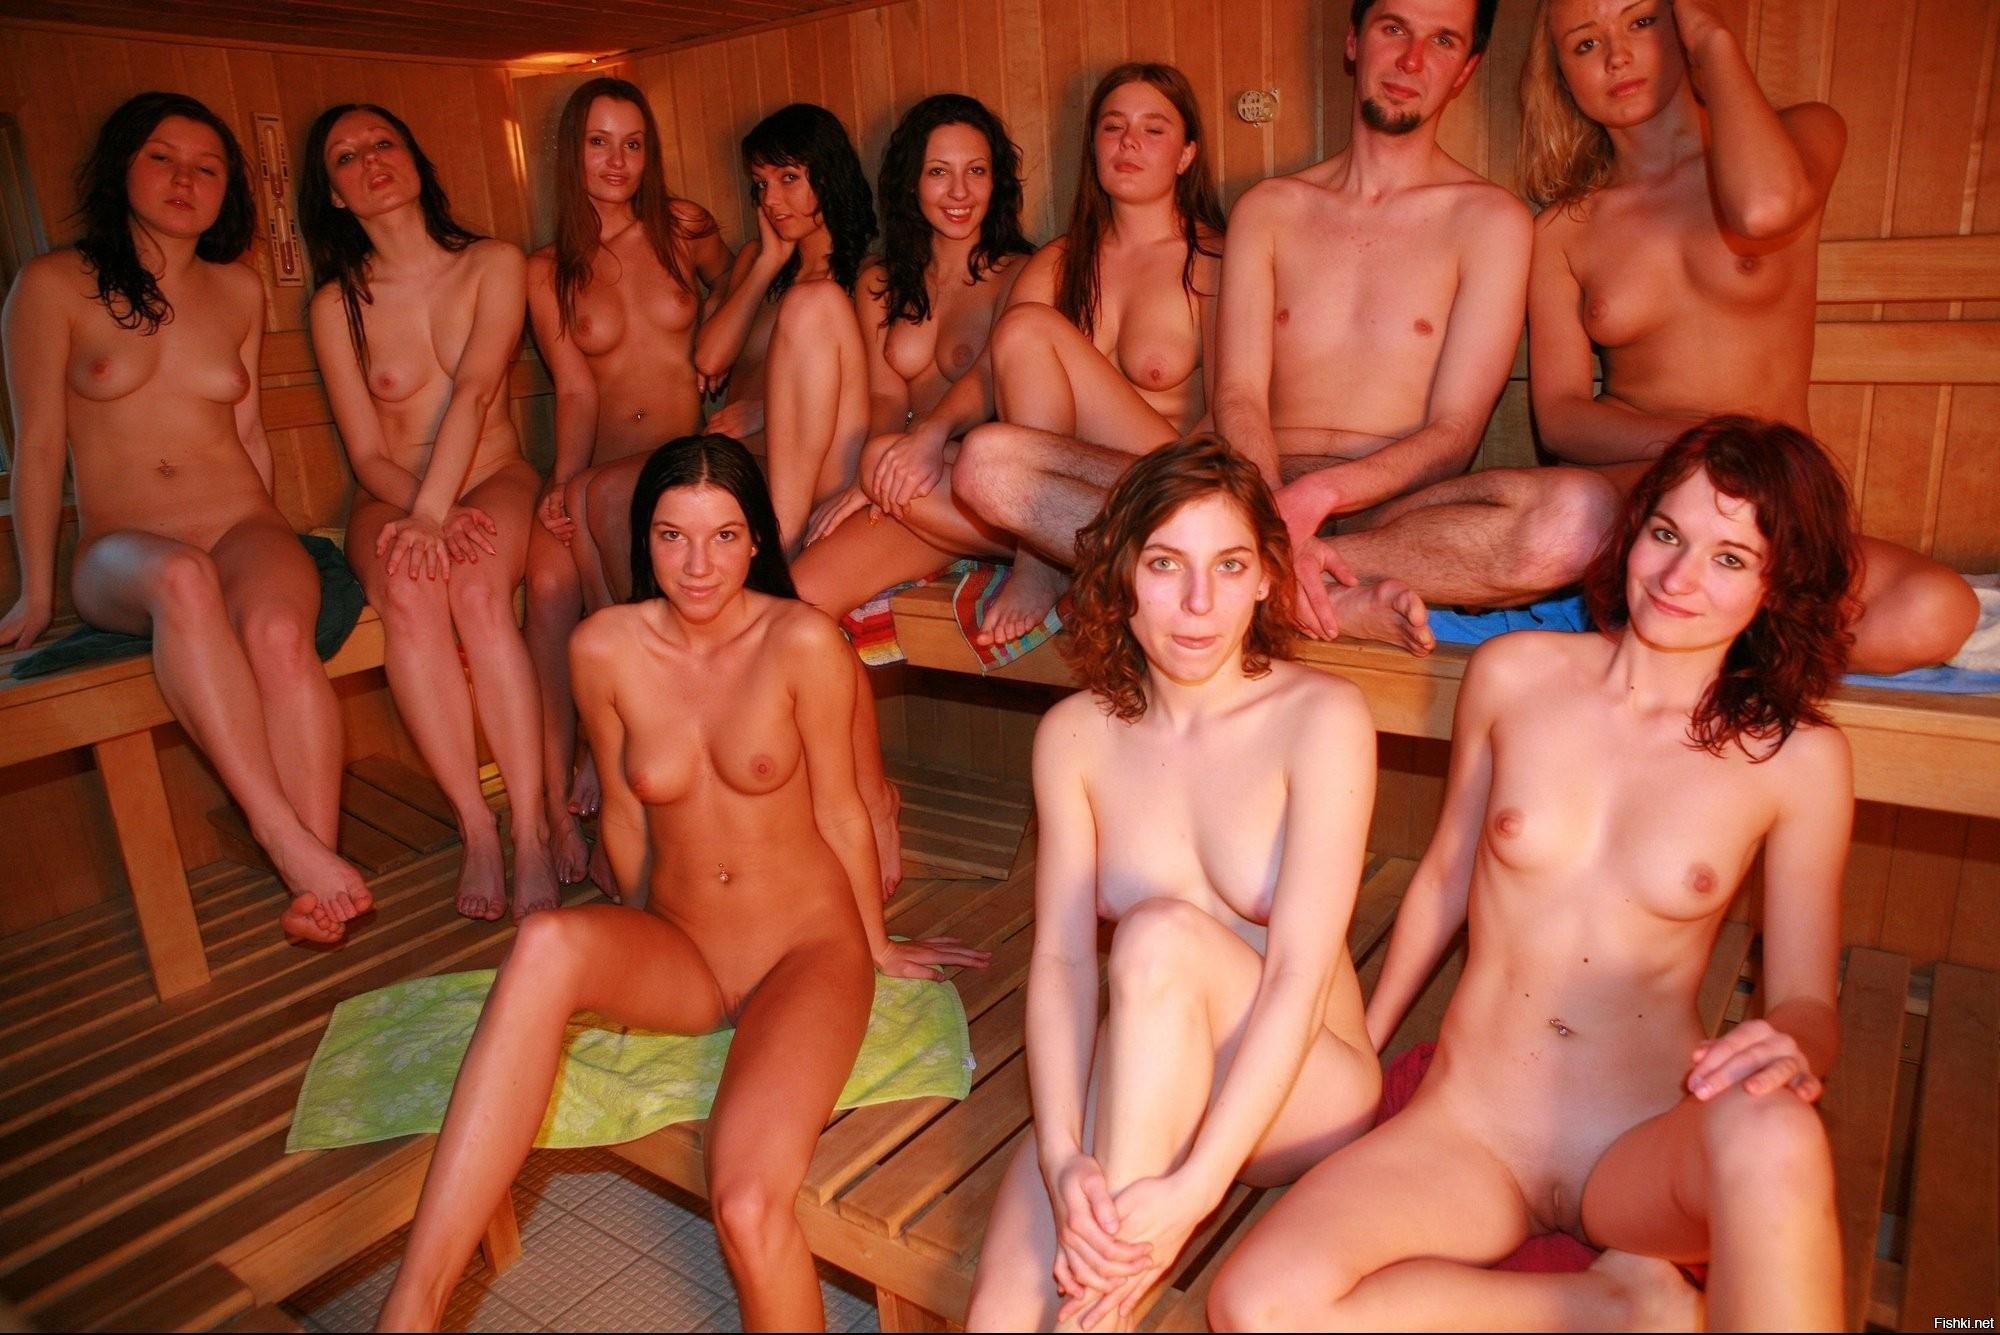 голые девушки с соц сетей в бане